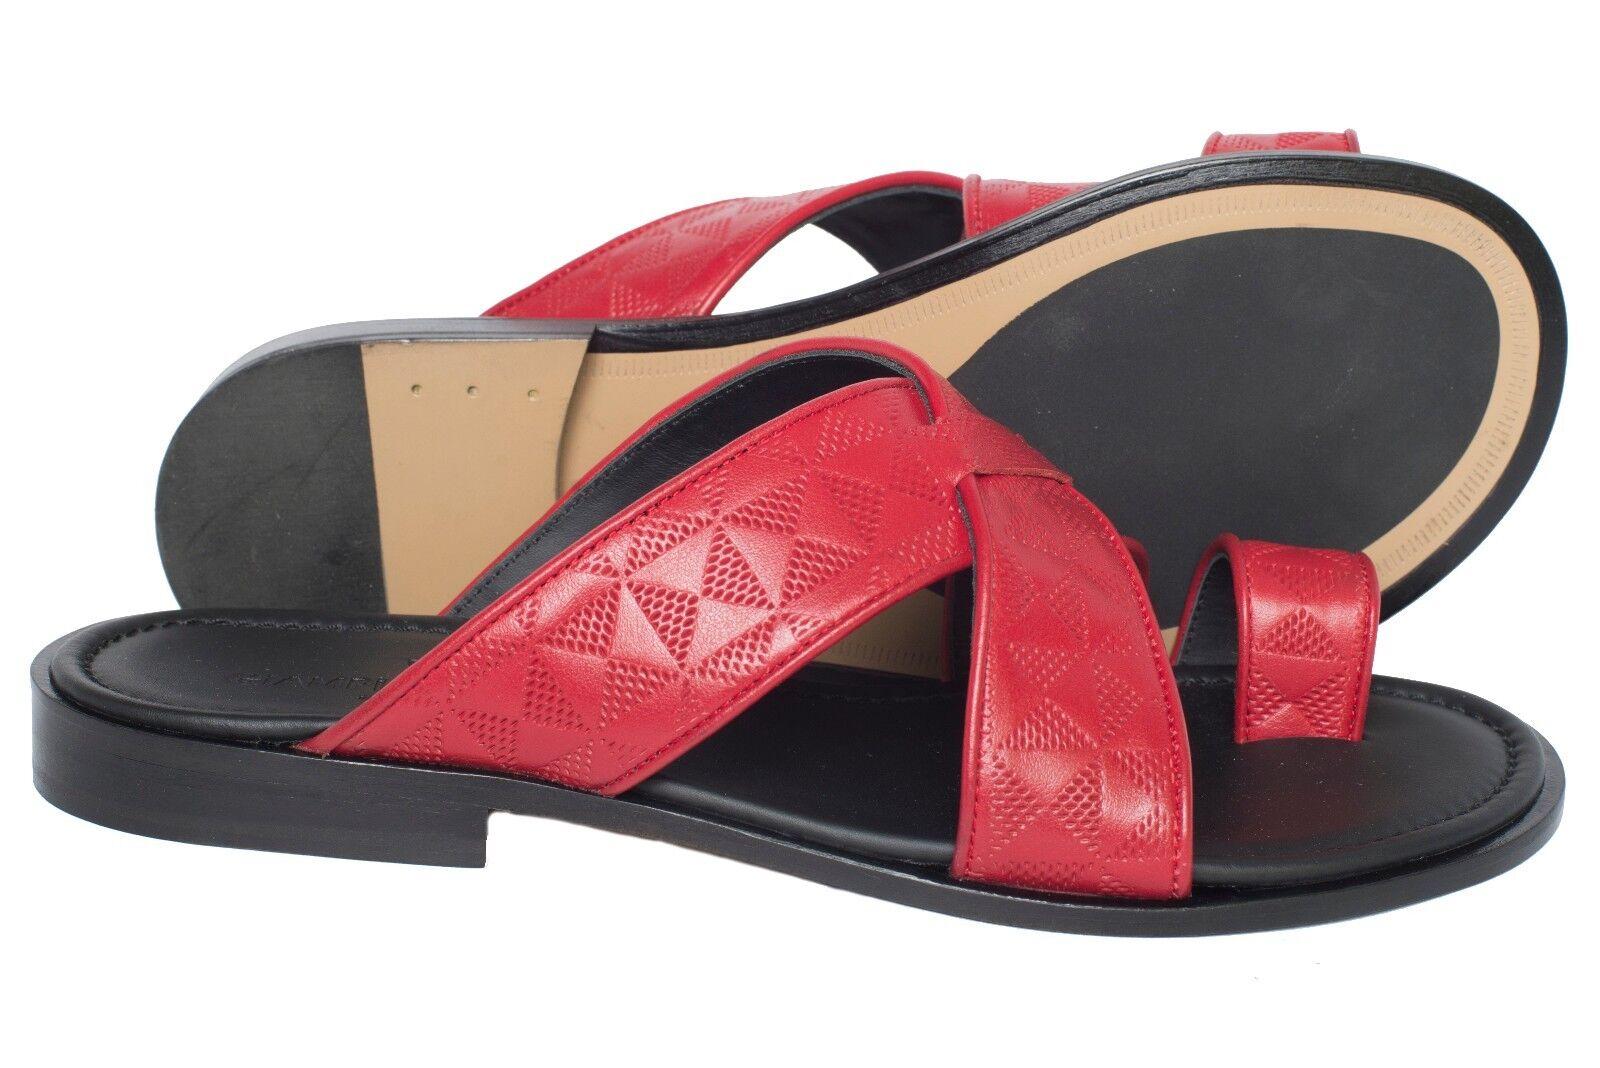 Giampieronicola 5027 Italian mens rot leather print sandals